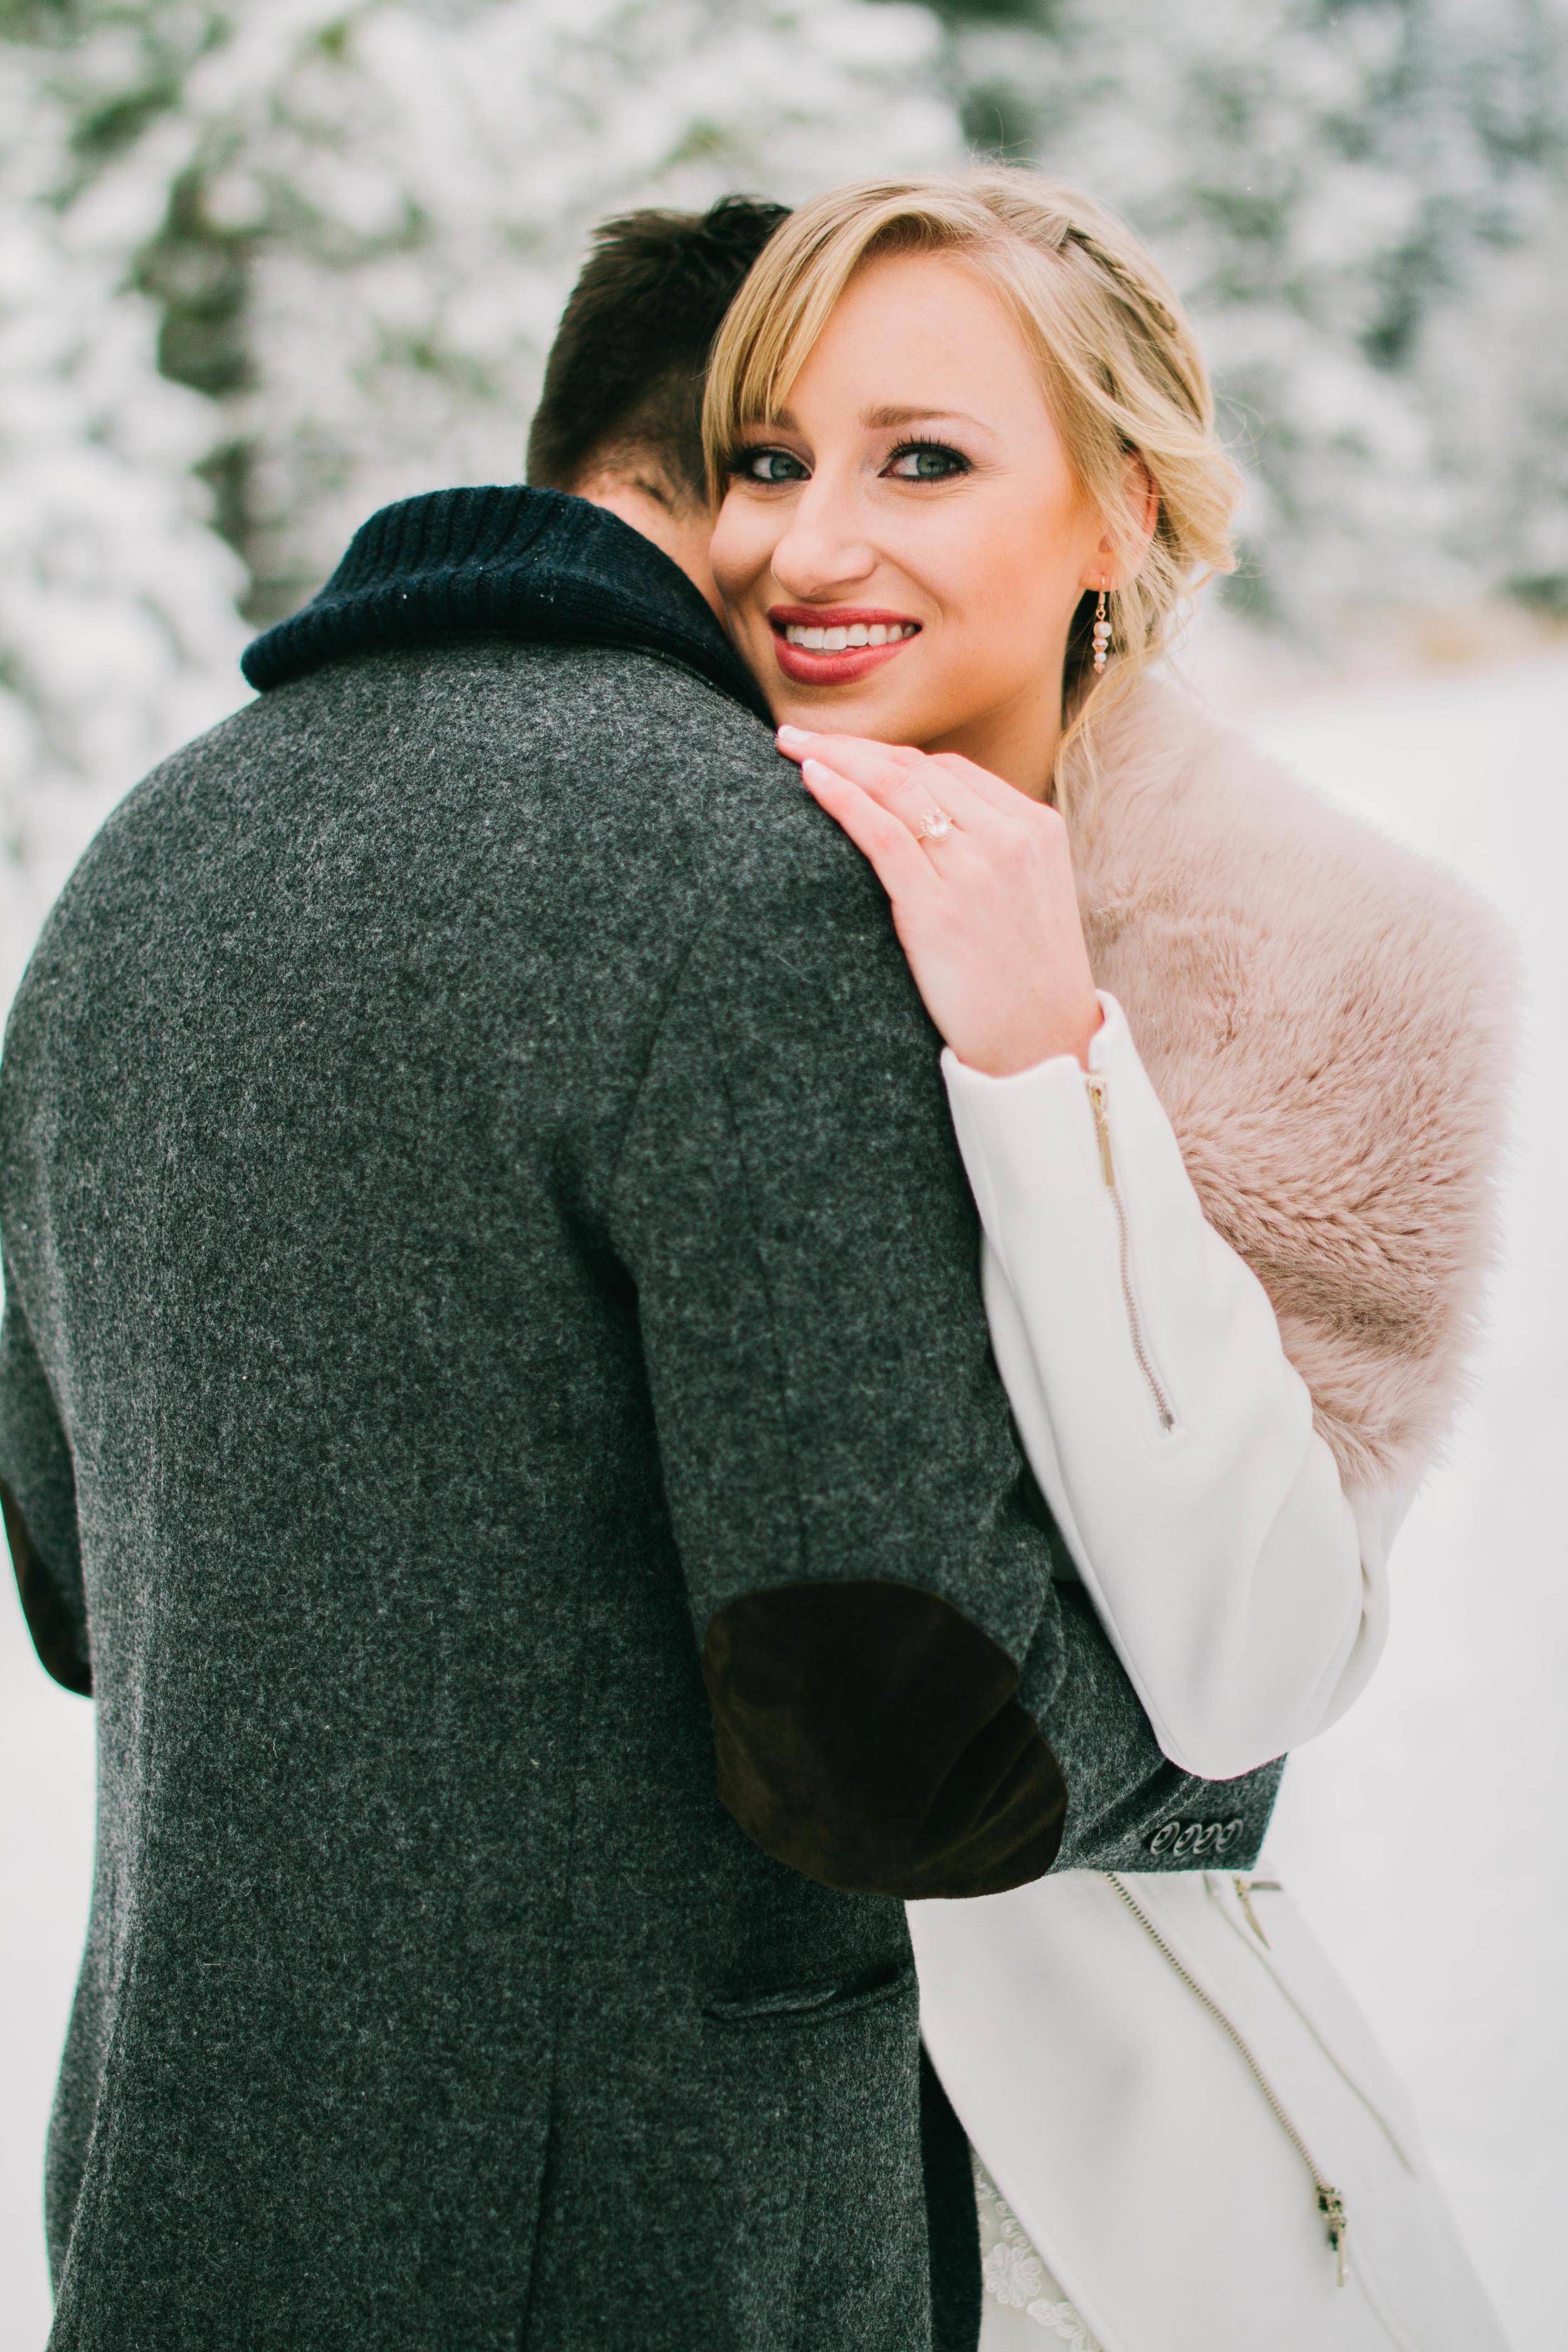 Bonin Wedding - Madeleine Bonin Photography-5770.jpg